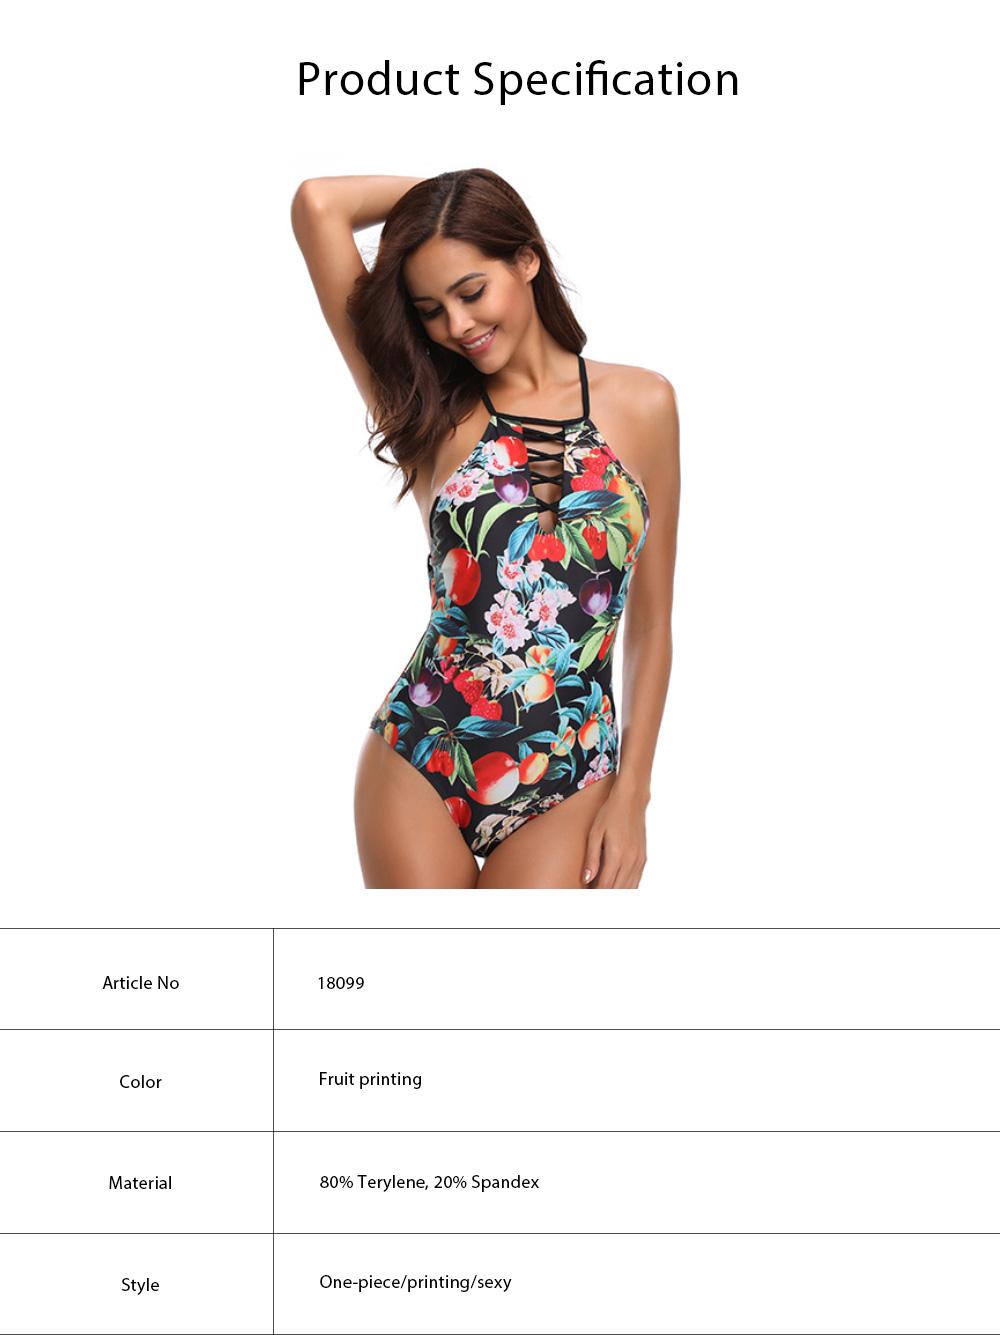 2019 Western Style Bikini Foreign Trade, Fashionable Sexy Fruit Printing One-piece Bikini, Dew Back Style Swim Wear 5